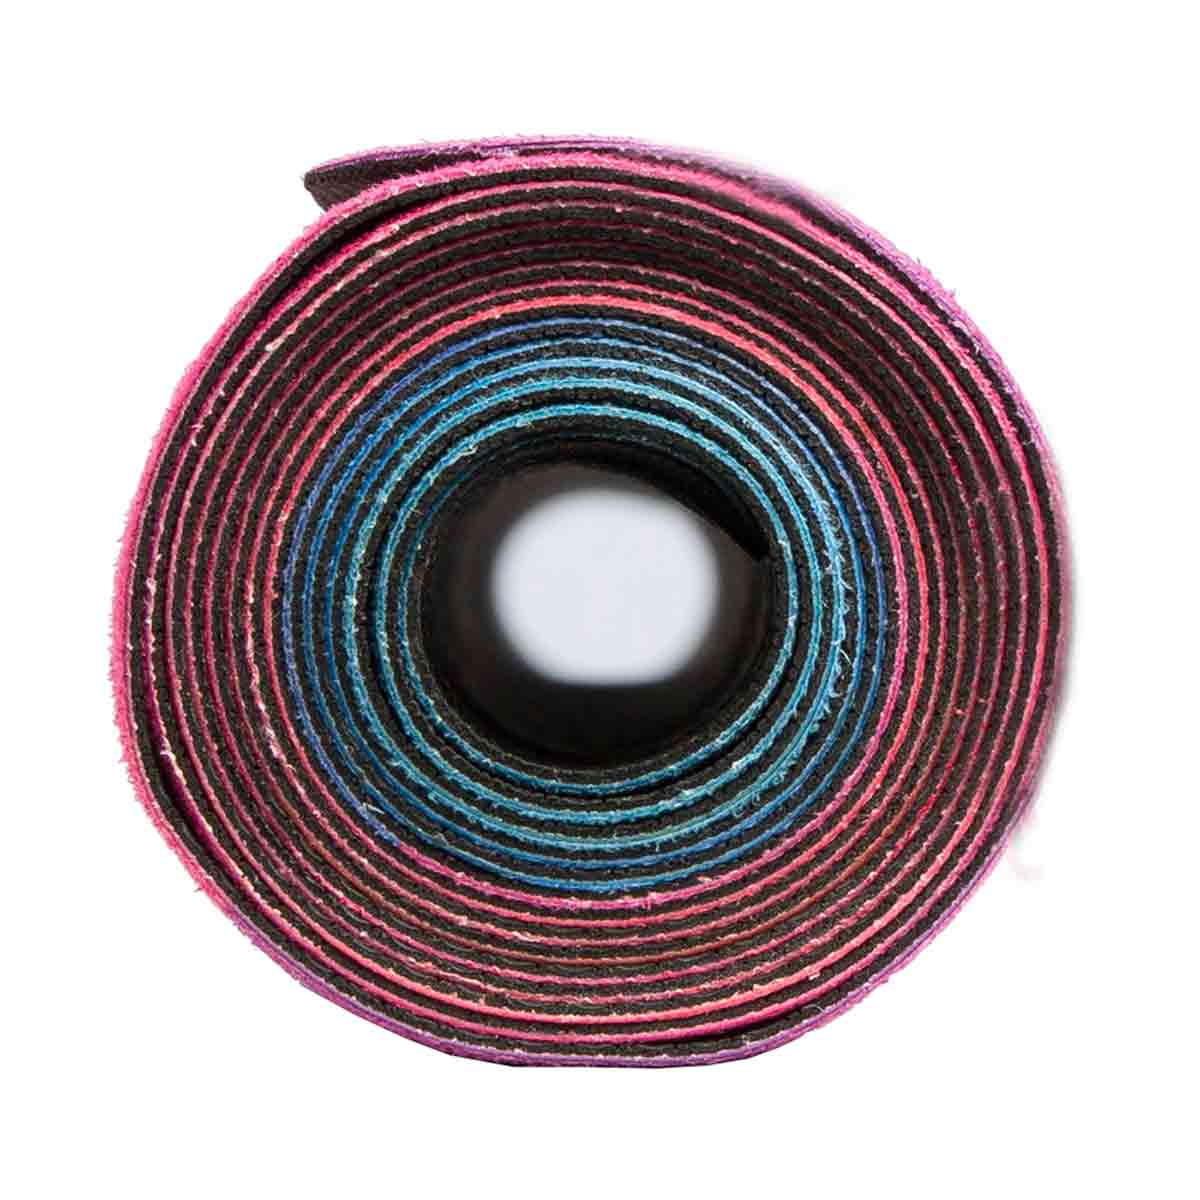 Dreamscape Micro Fibre Travel Yoga Mat Supawell